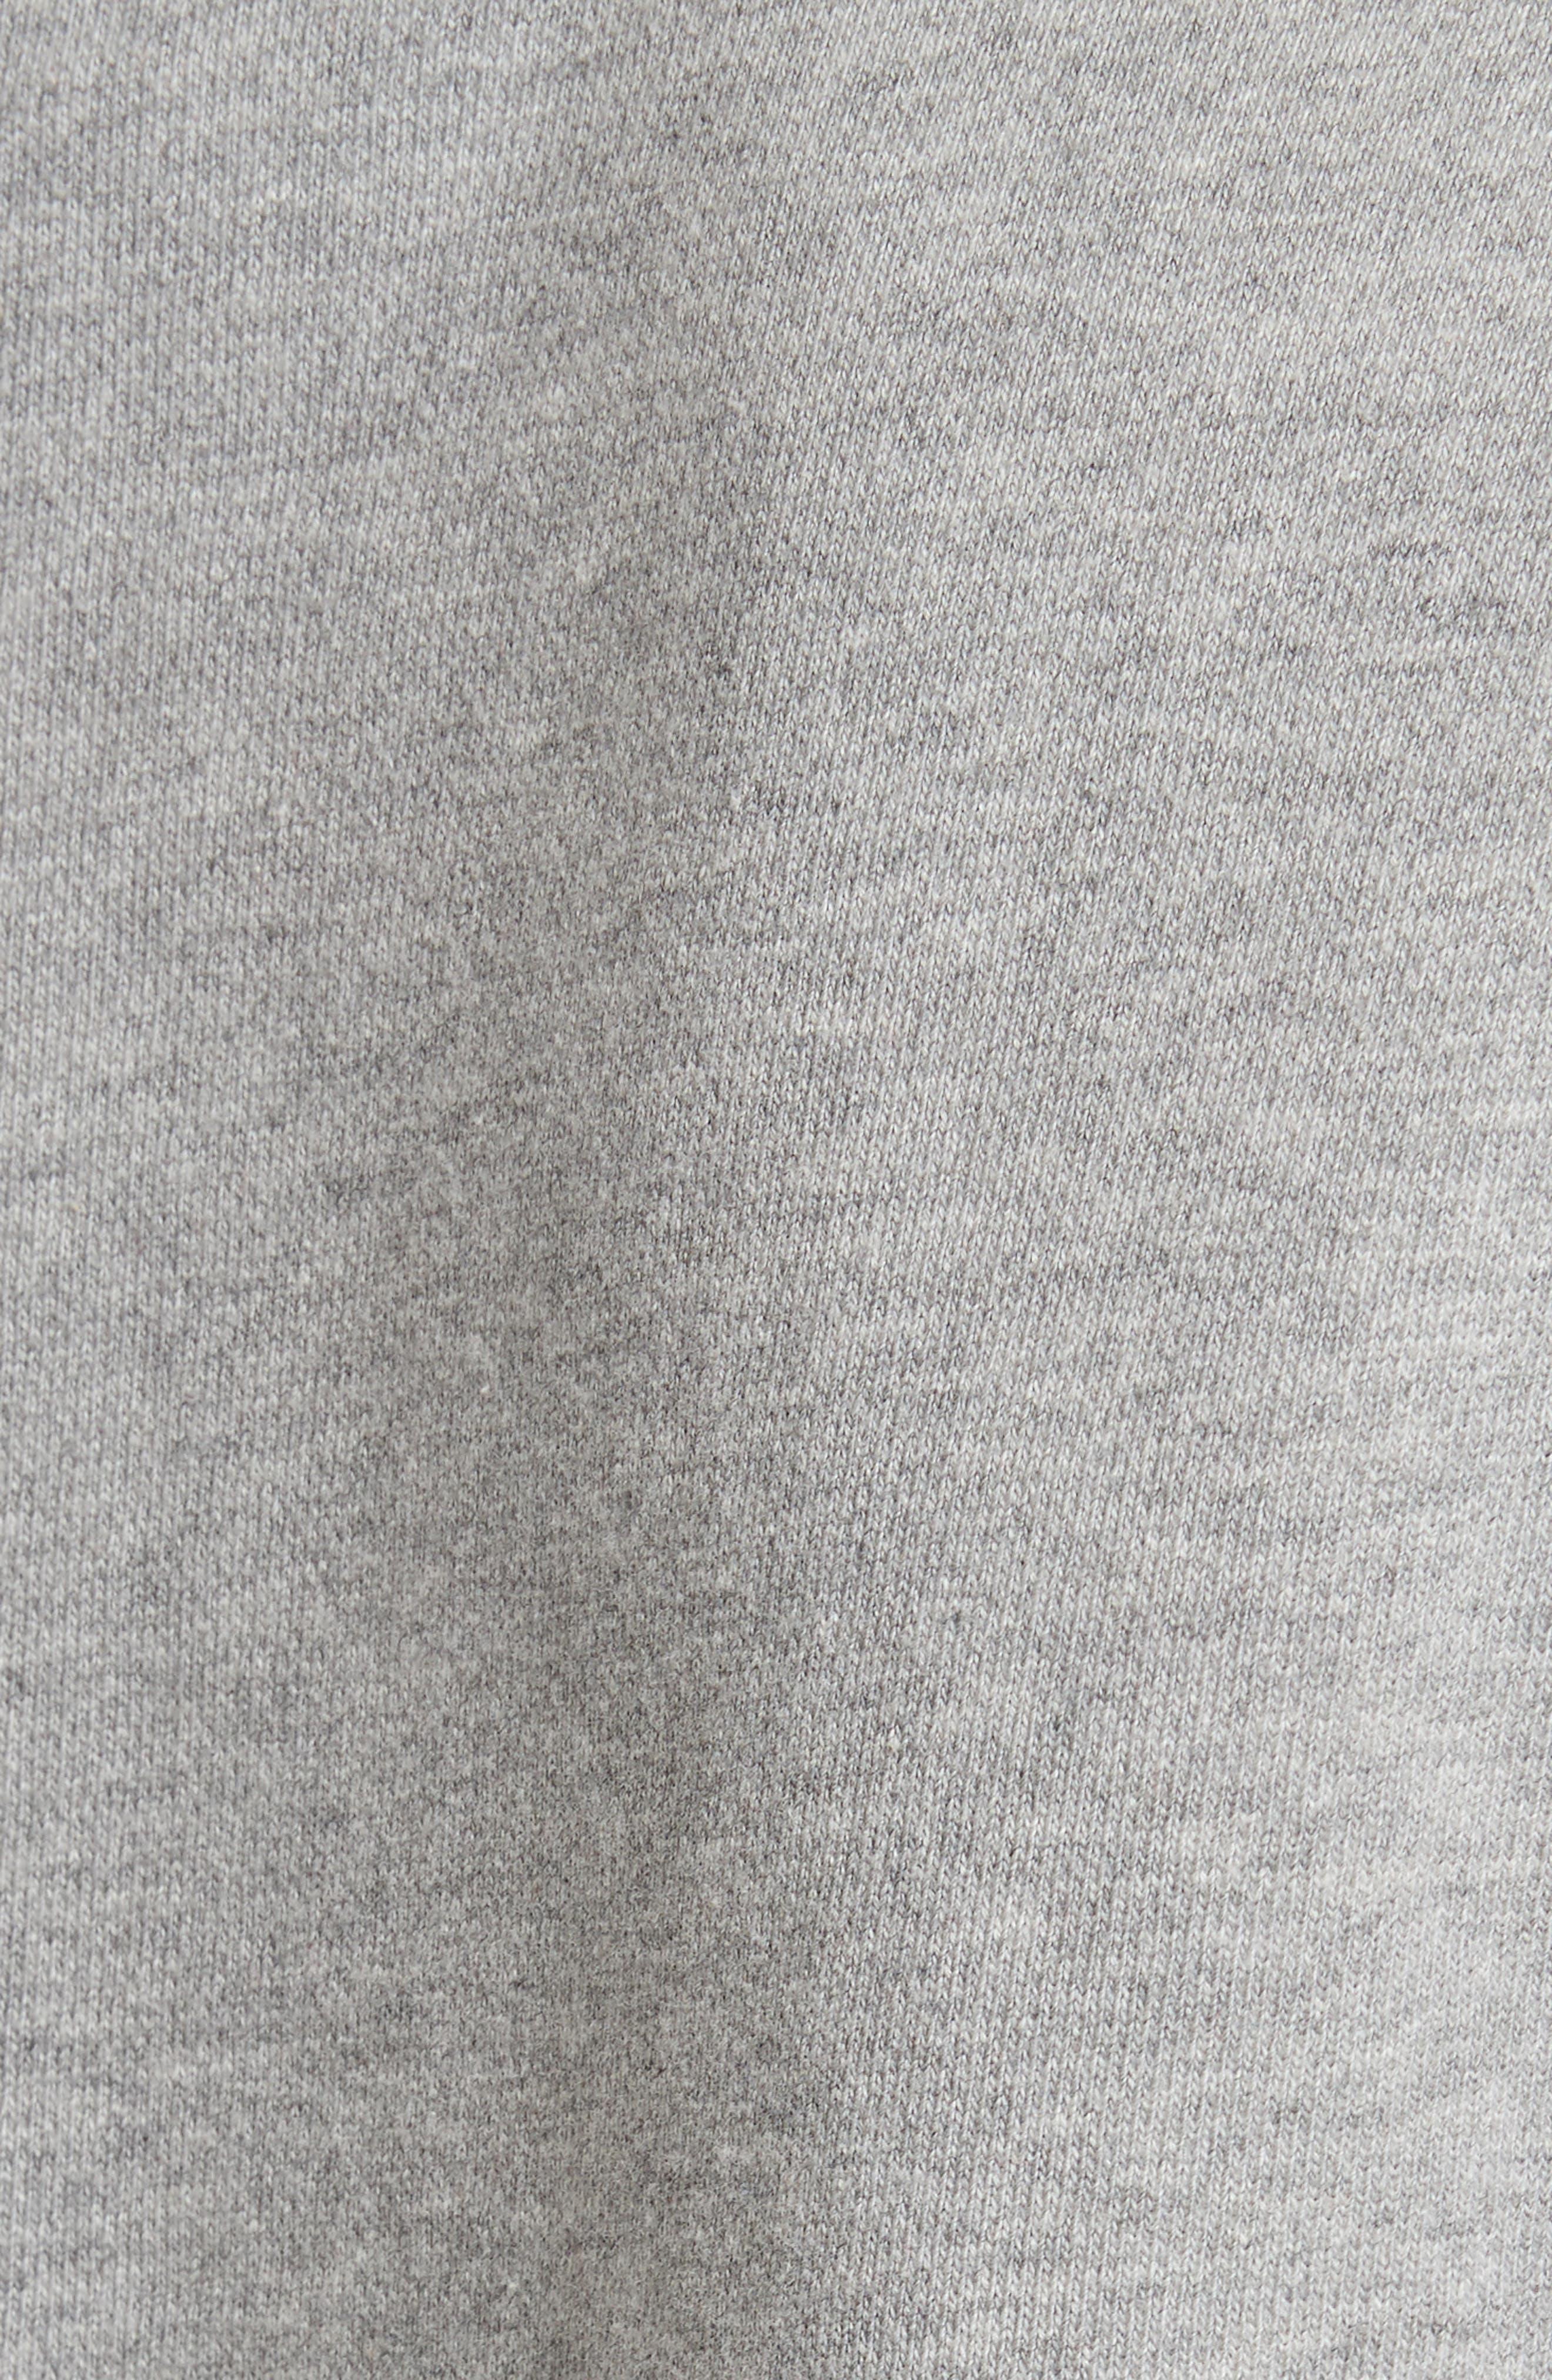 Pierced Sleeve Sweatshirt,                             Alternate thumbnail 5, color,                             031